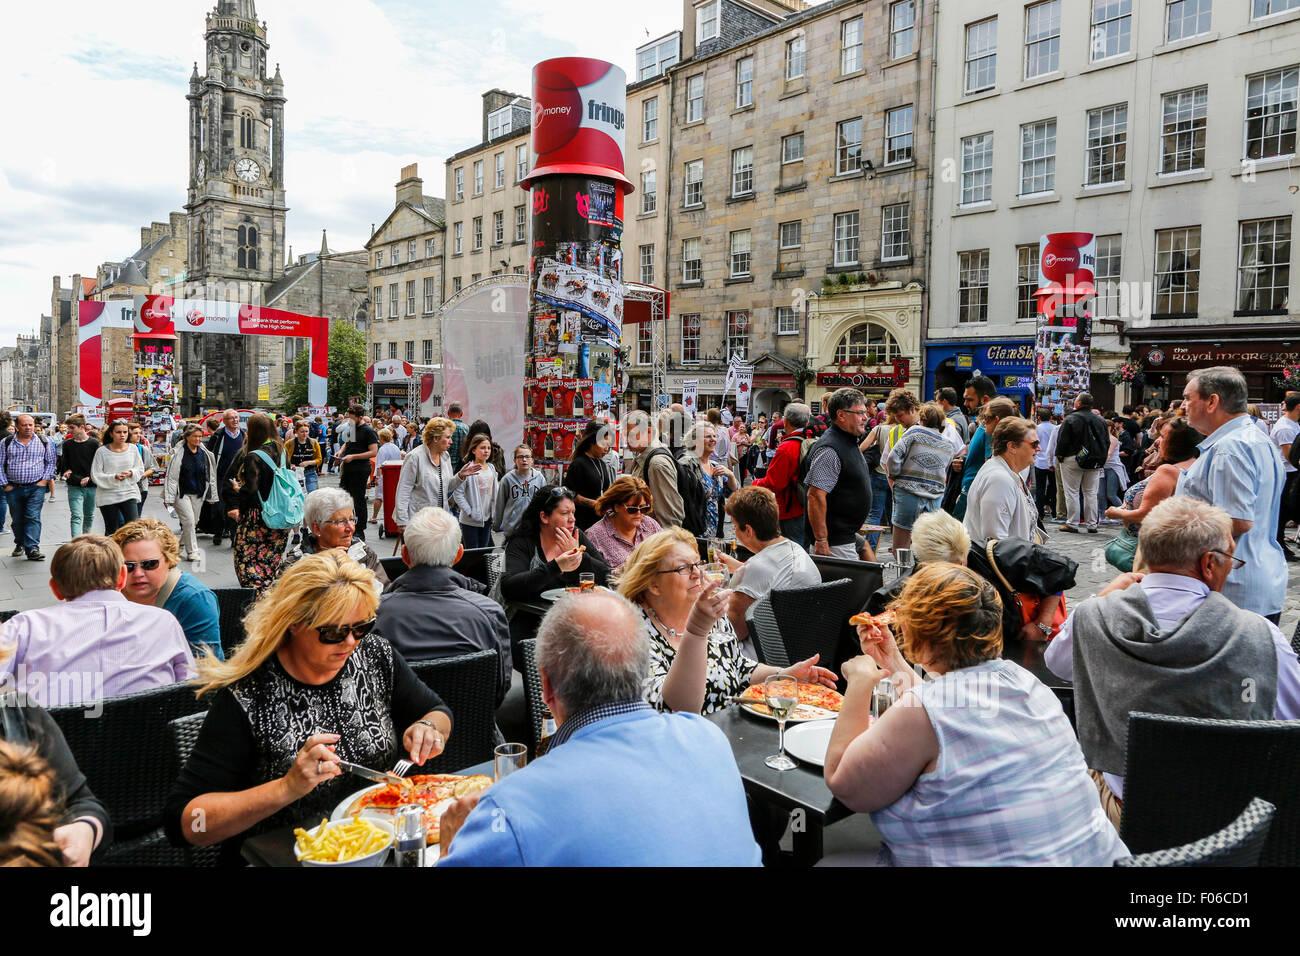 Edinburgh, Scotland, UK. 8th Aug, 2015. On the first Saturday of the Edinburgh Fringe, visitors to Edinburgh were - Stock Image